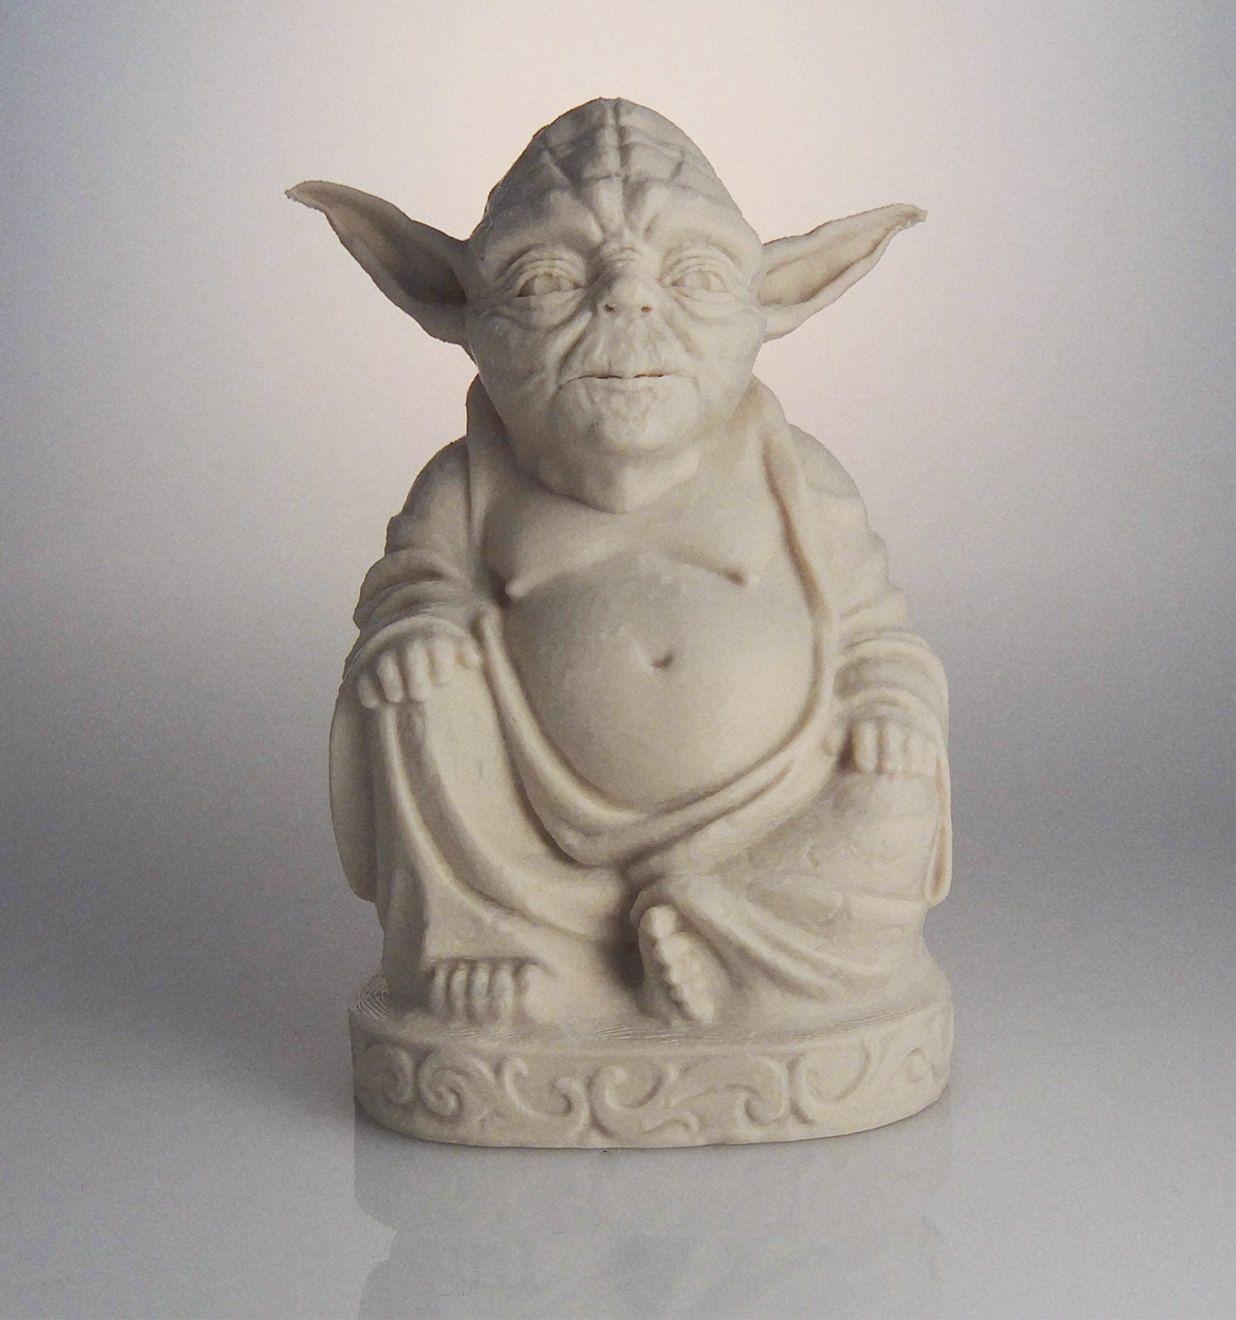 Star Wars Zen Yoda Tatooine Sand By Muckychris On Etsy Need